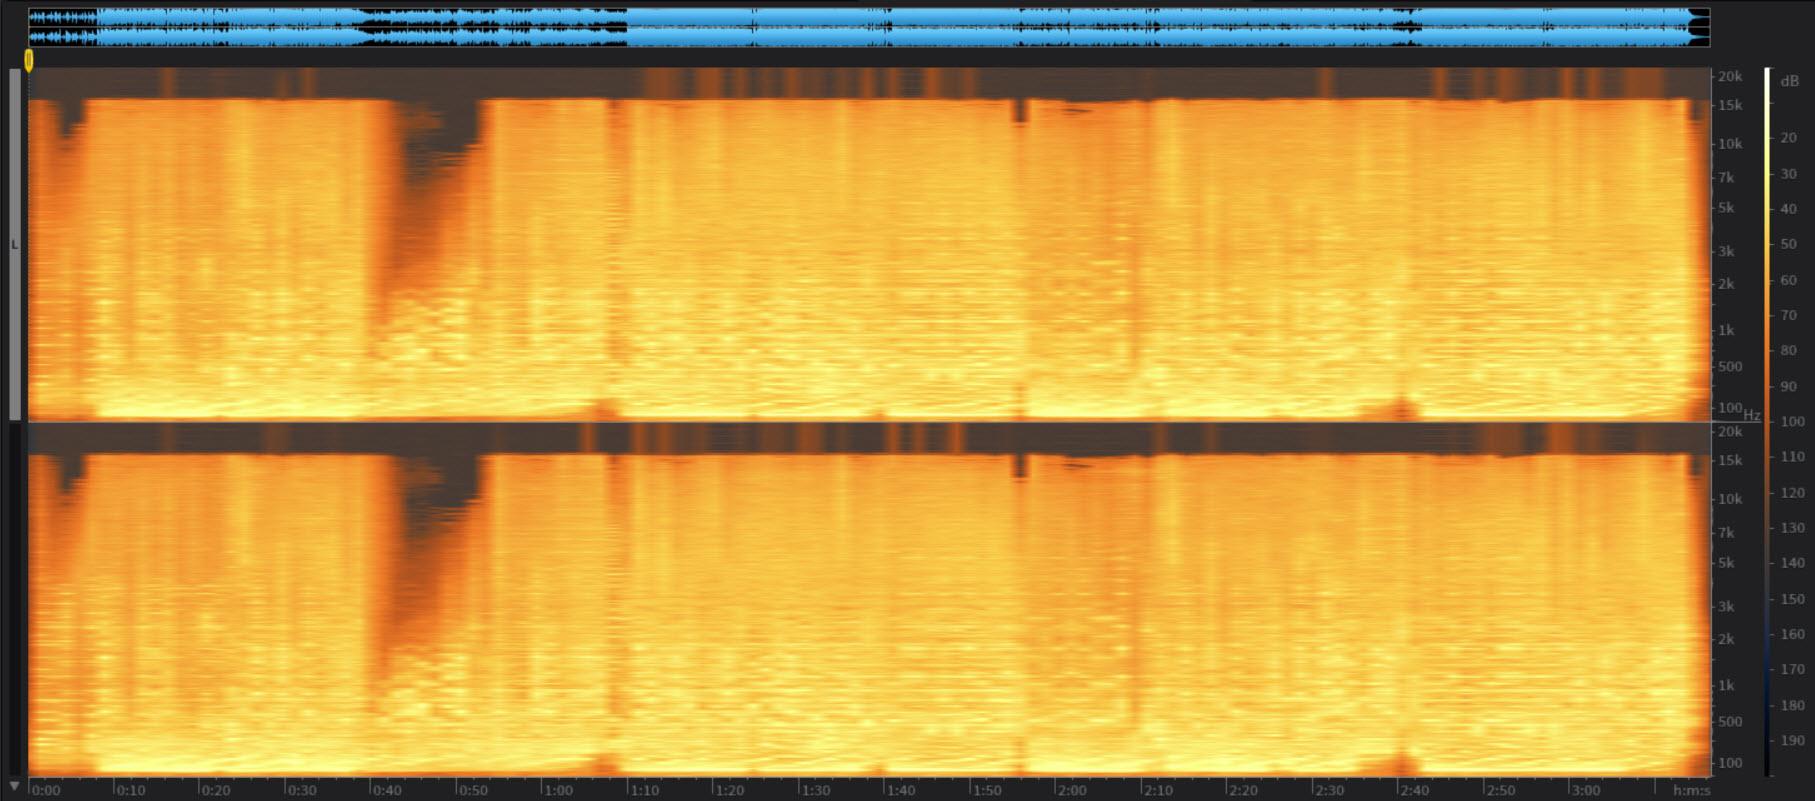 David Guetta distorto spettrogramma.jpg